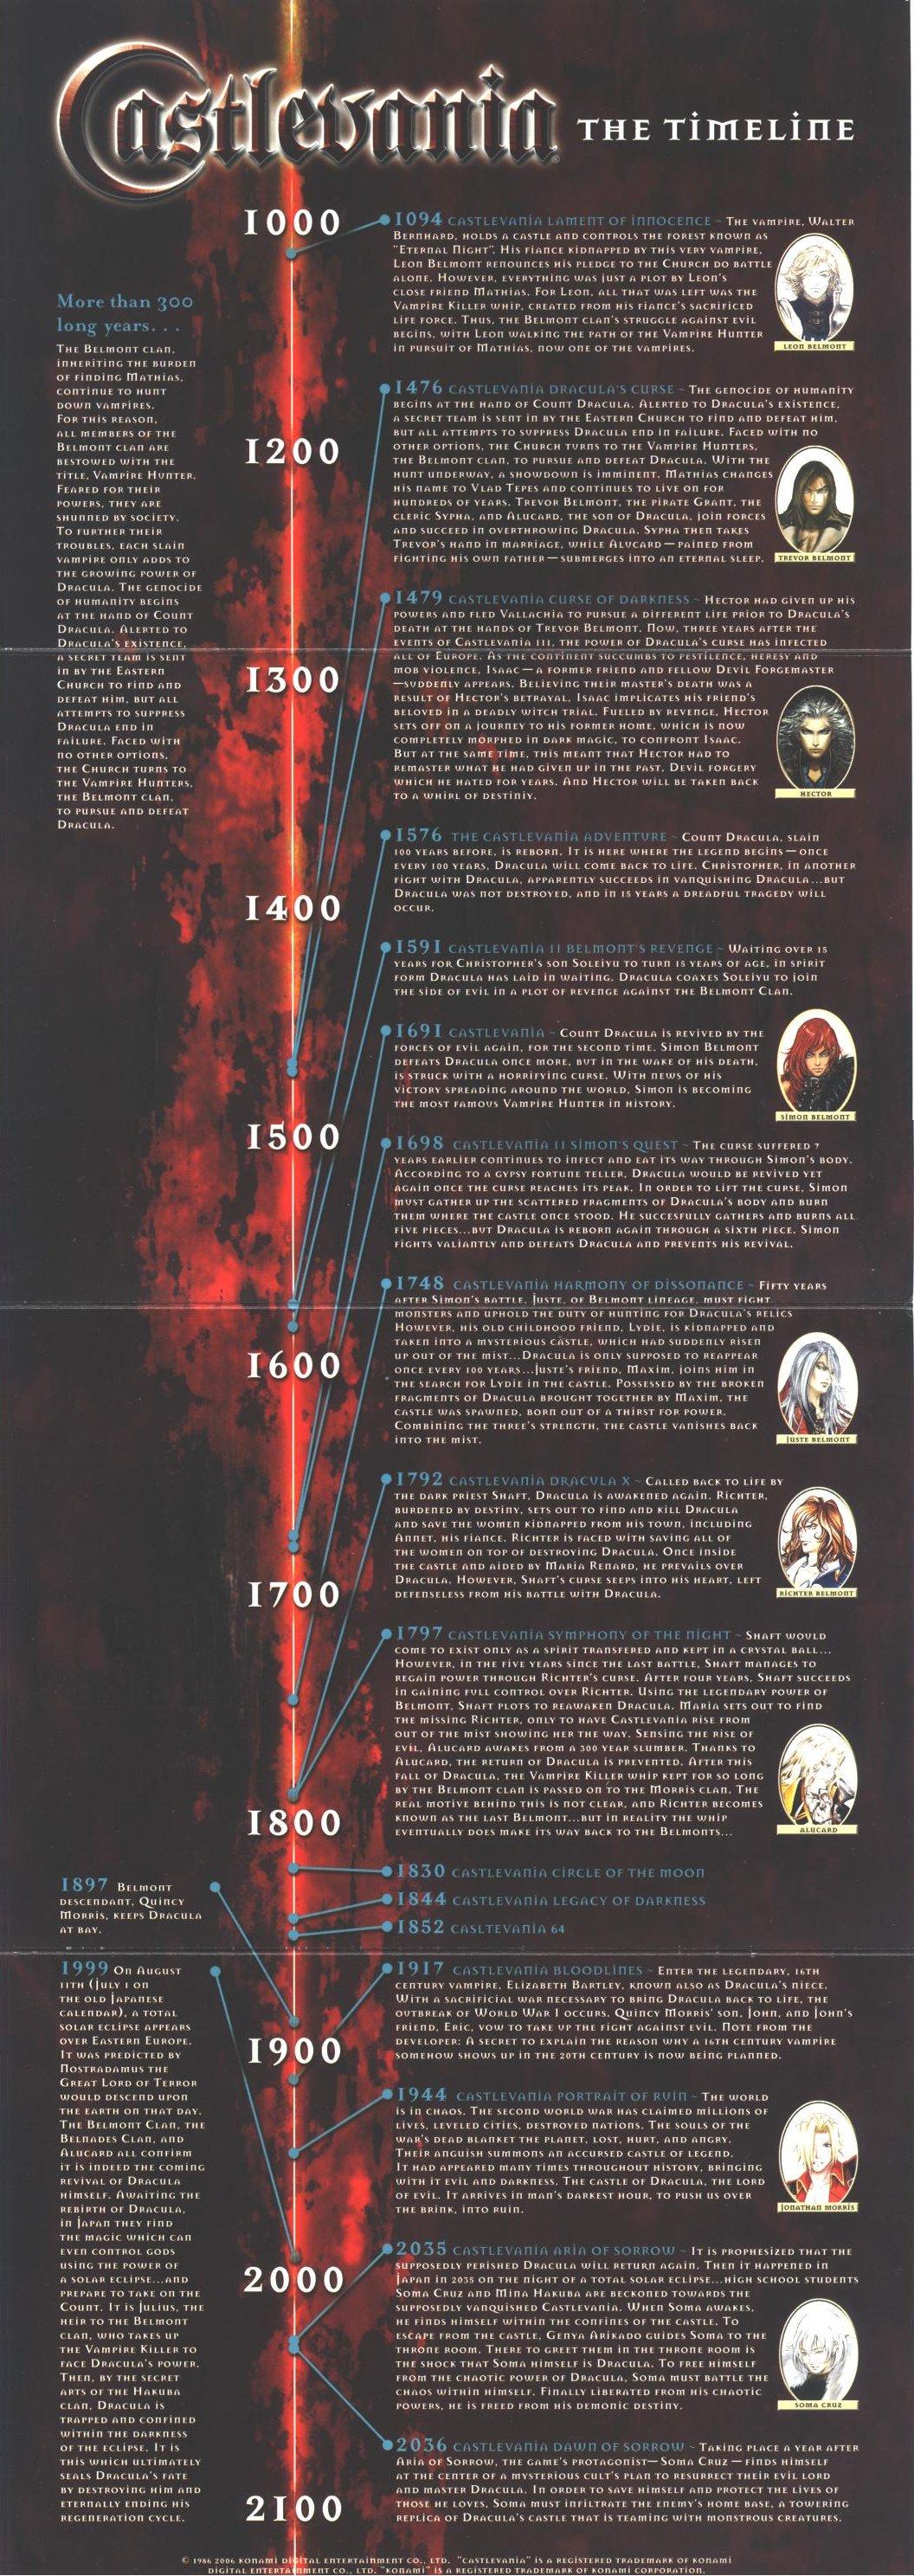 just created a castlevania timeline    castlevania